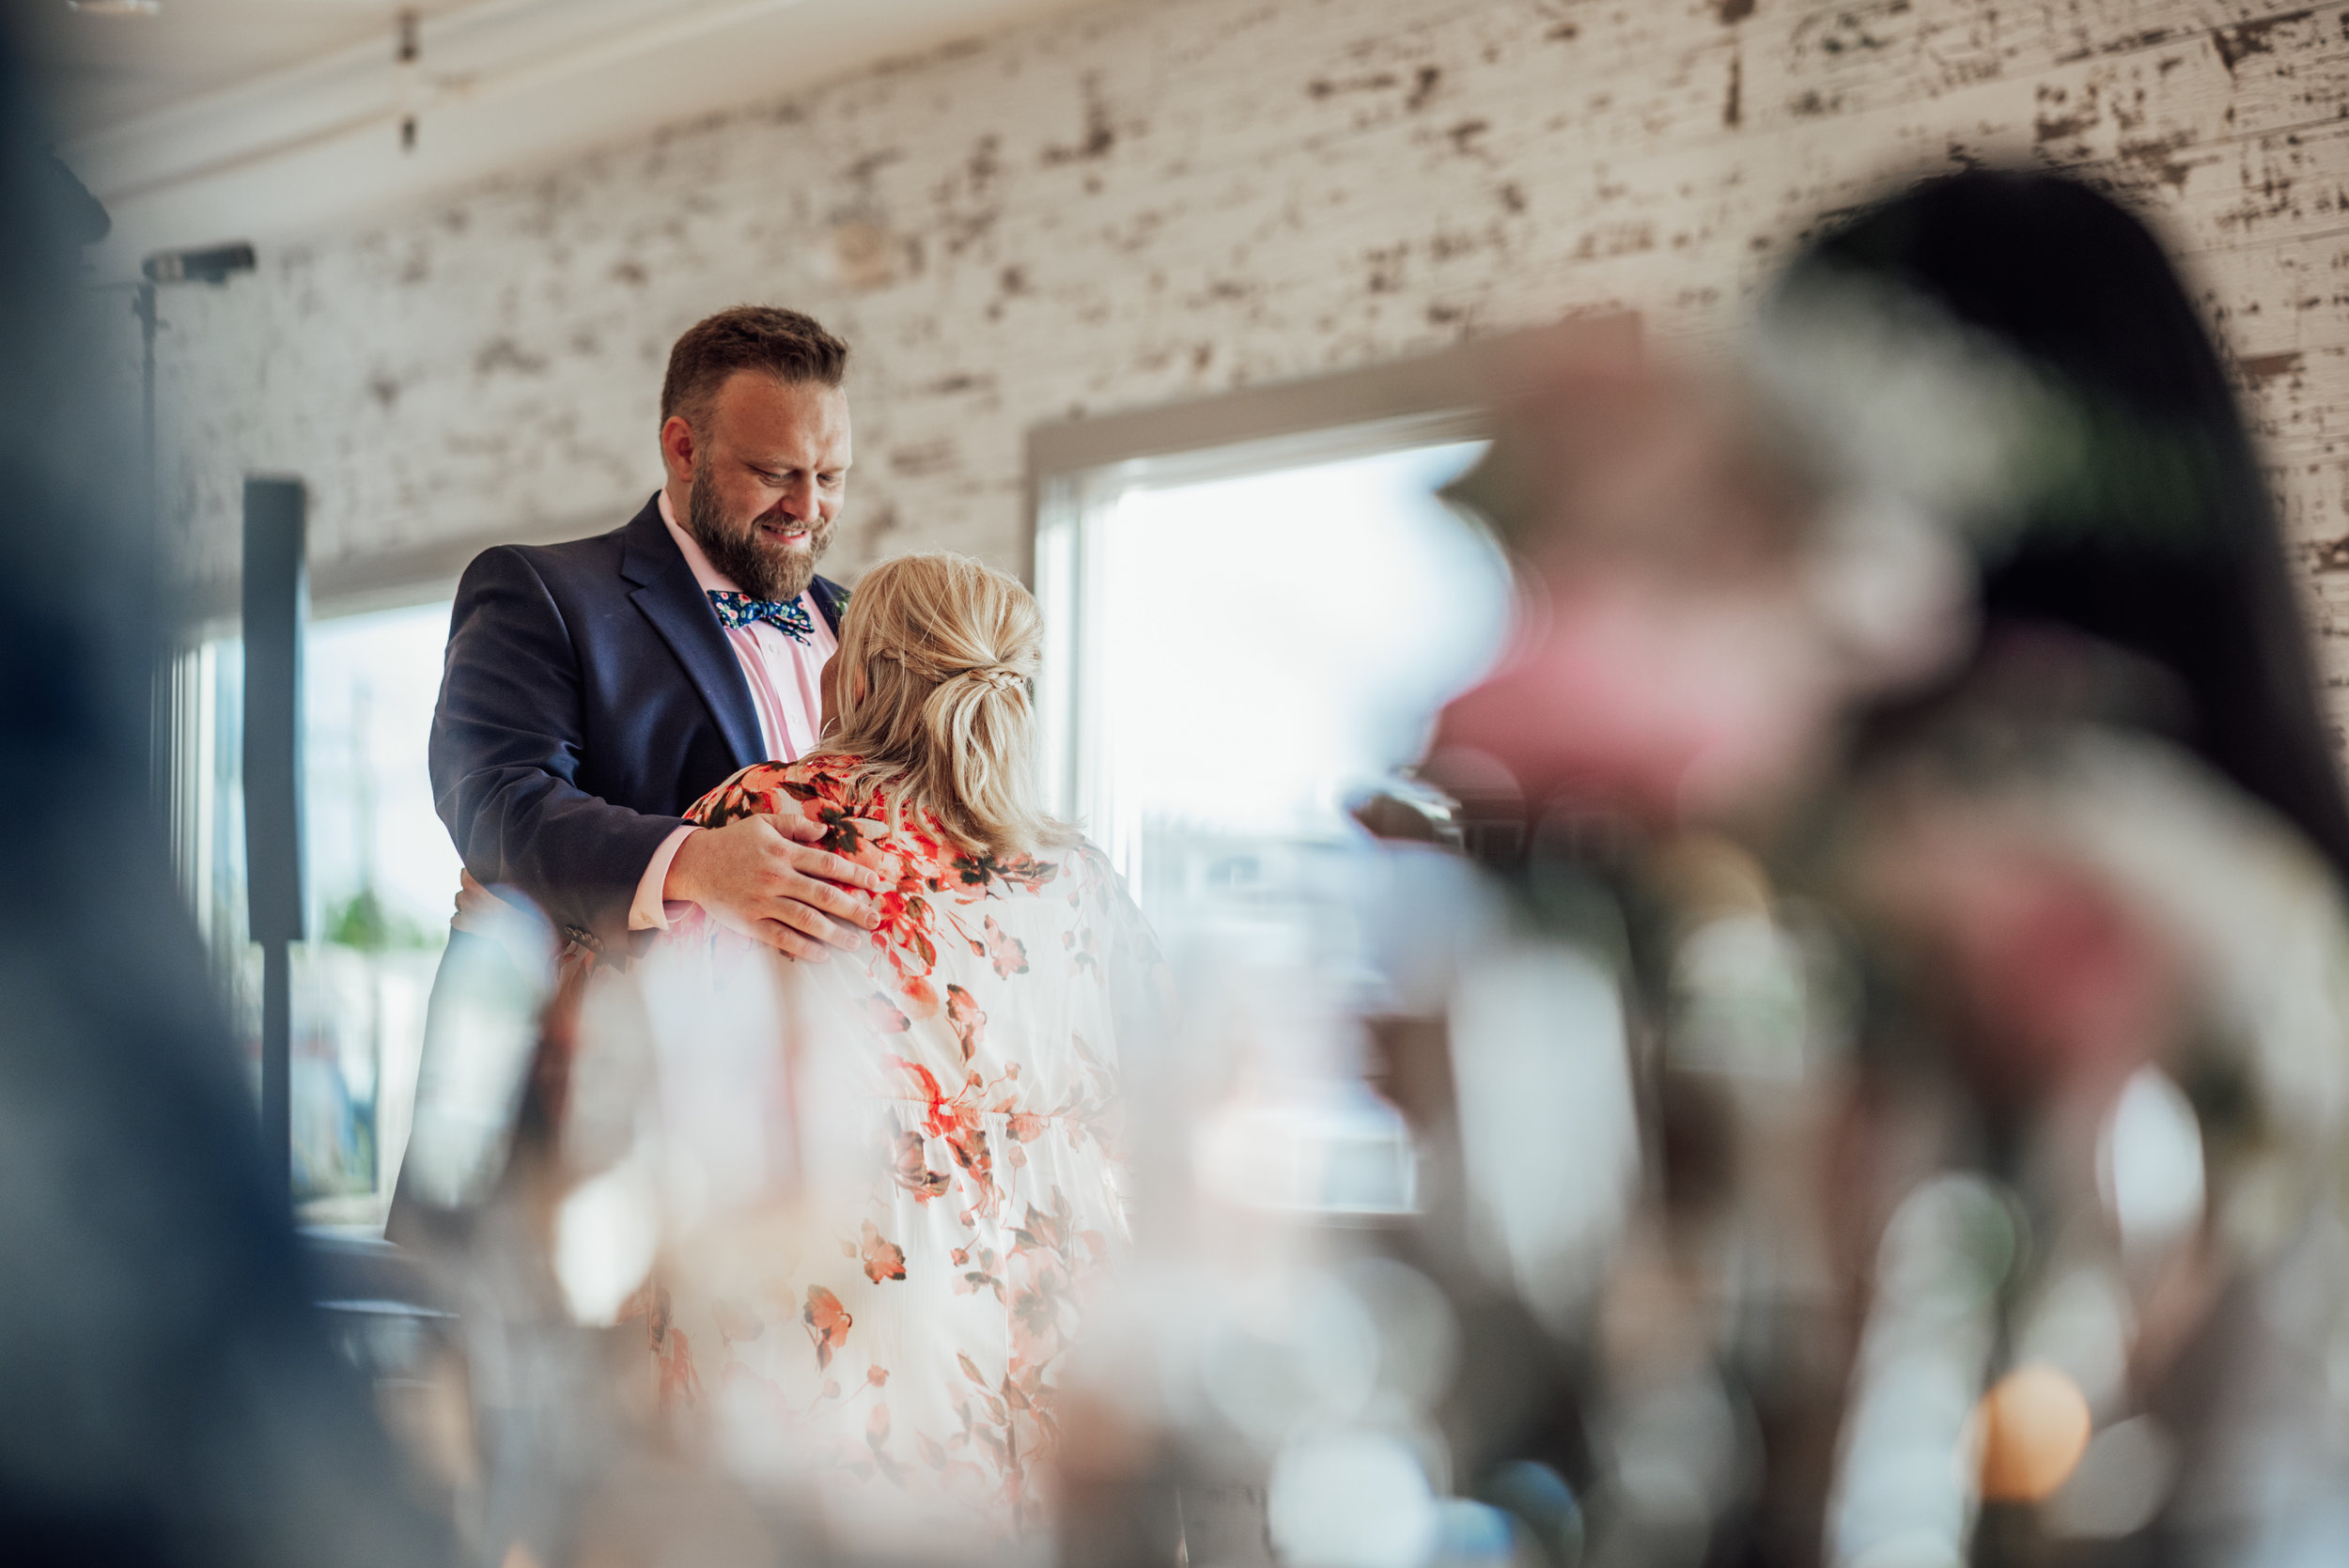 New Jersey Wedding Photographer, Felsberg Photography LBI wedding photography 99.jpg